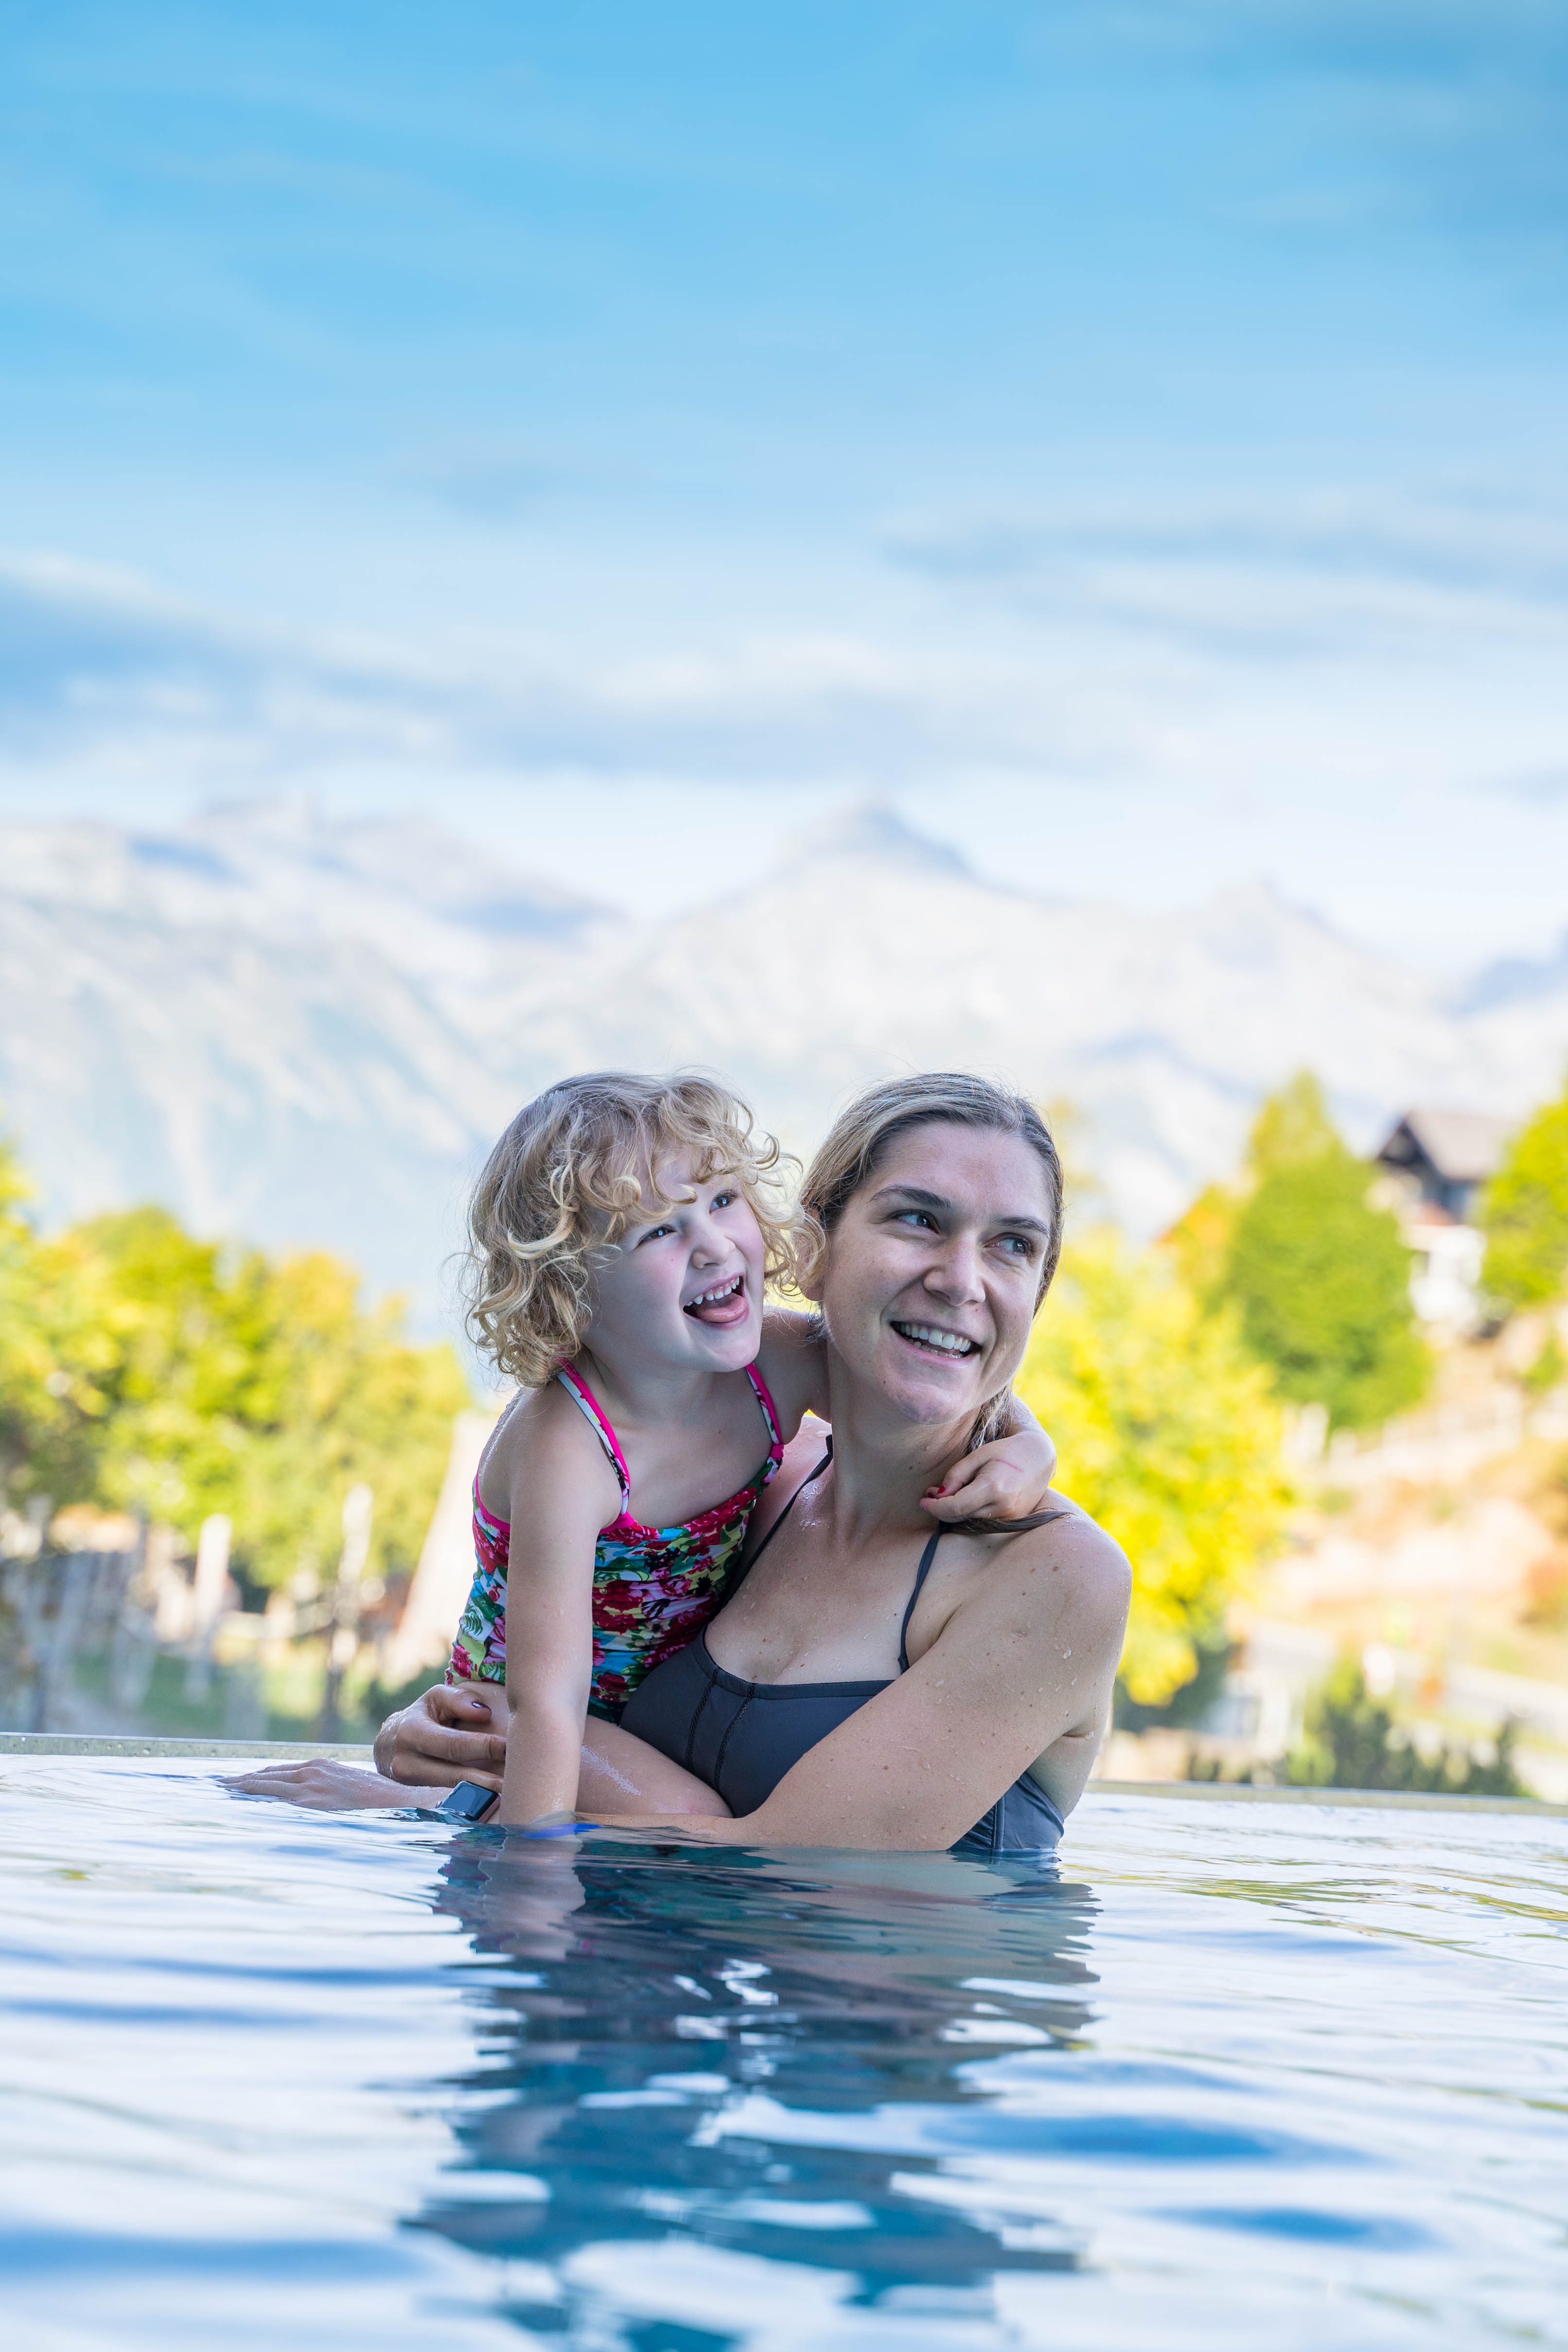 Wandern in Nenas mit Kindern / Herbst im Wallis